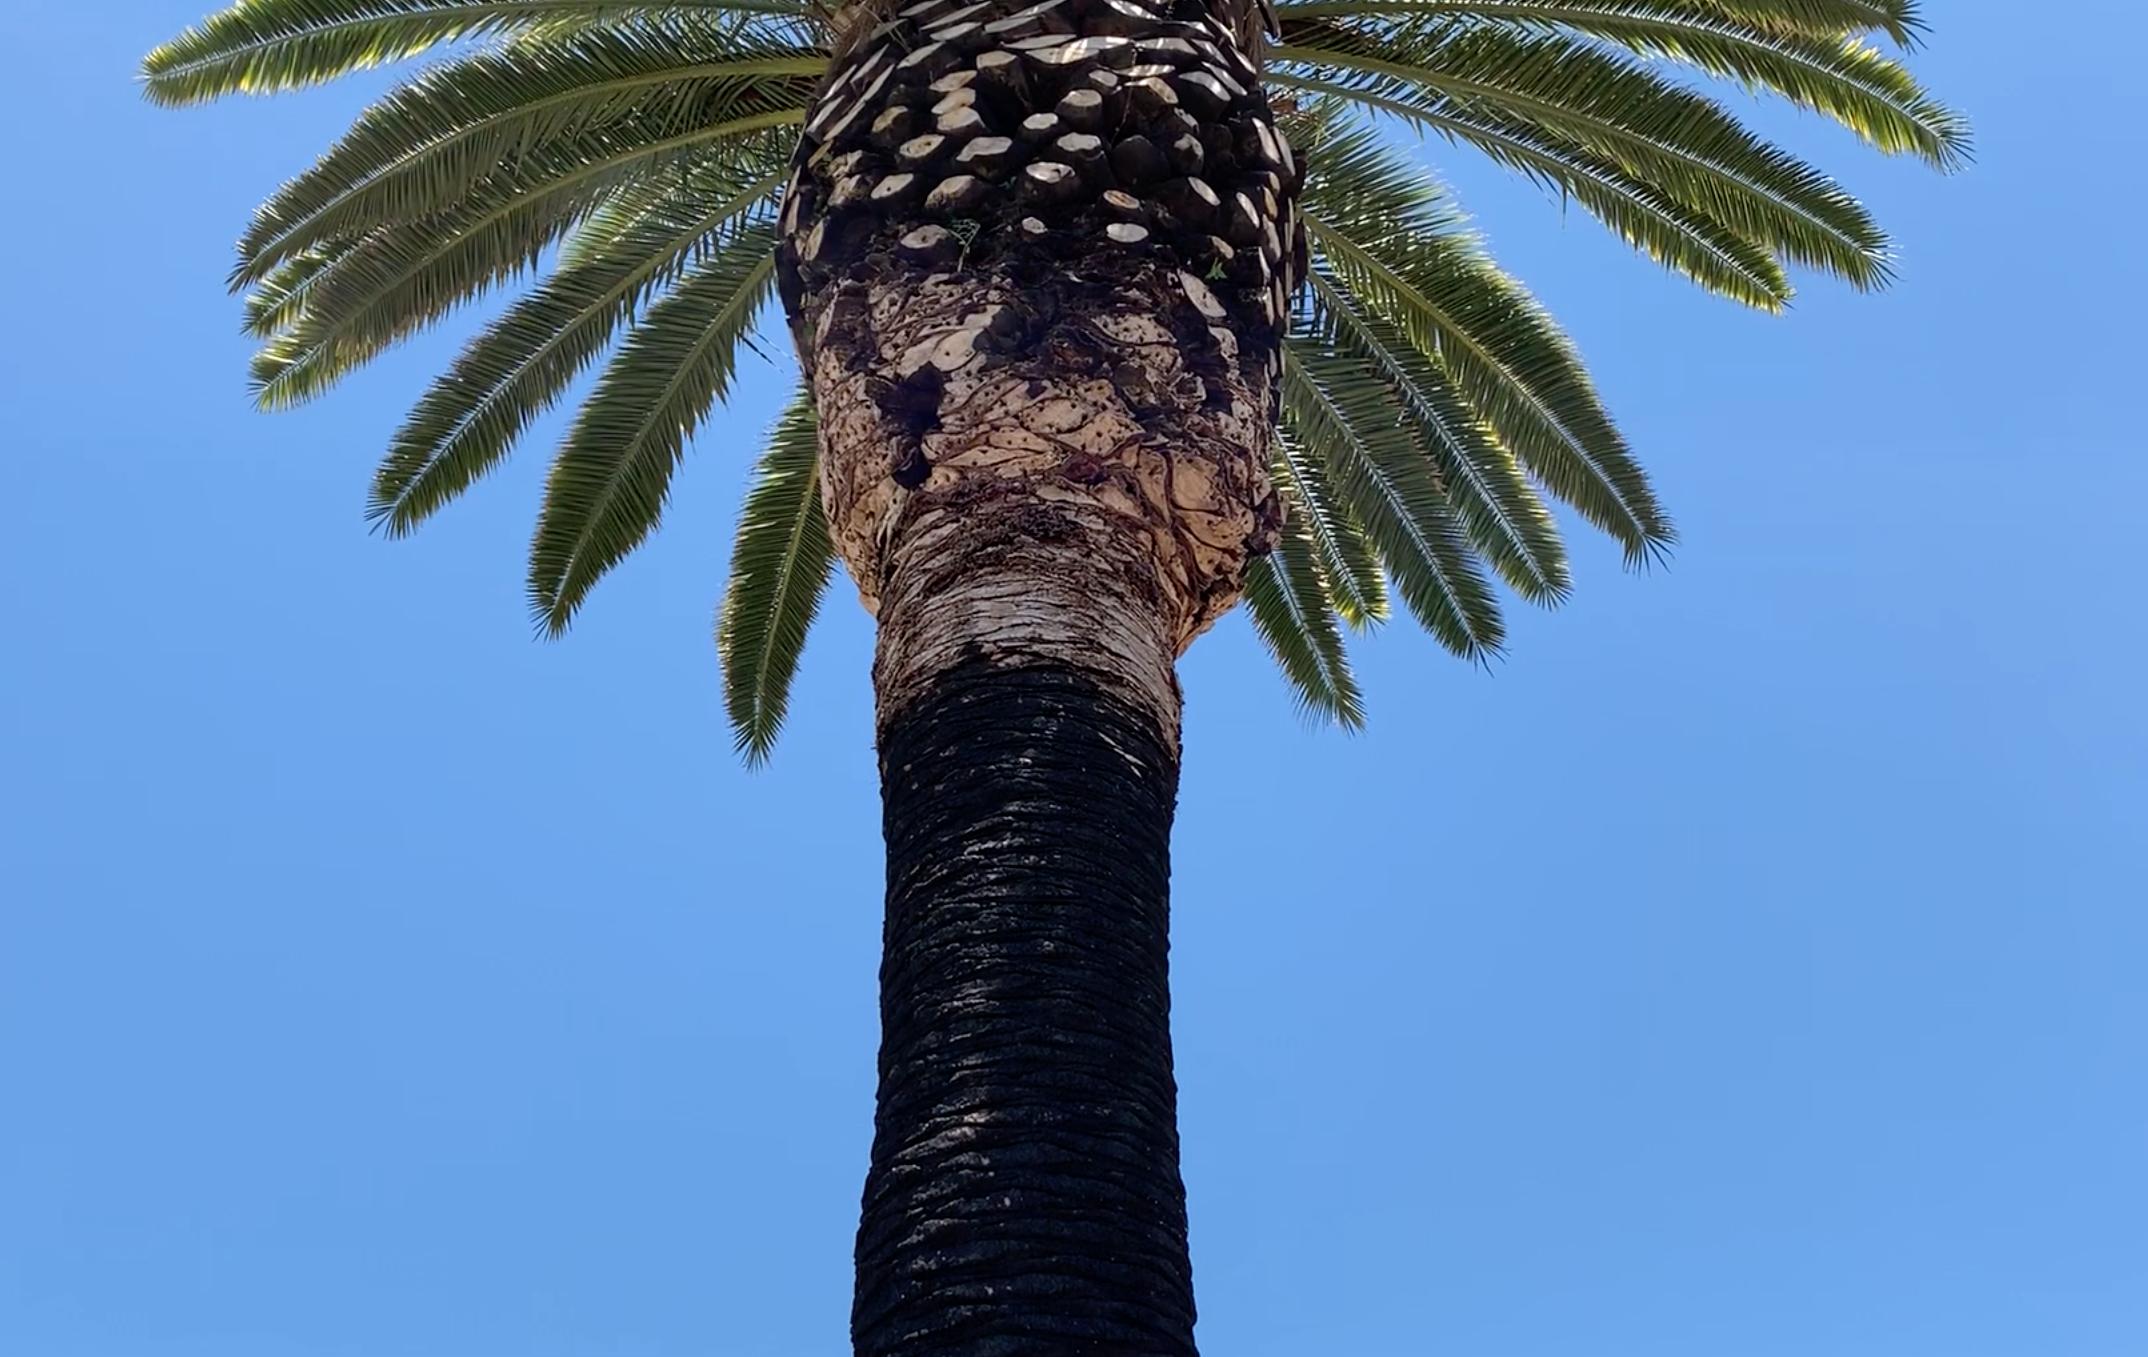 Date Palm. Santa Rosa, CA.